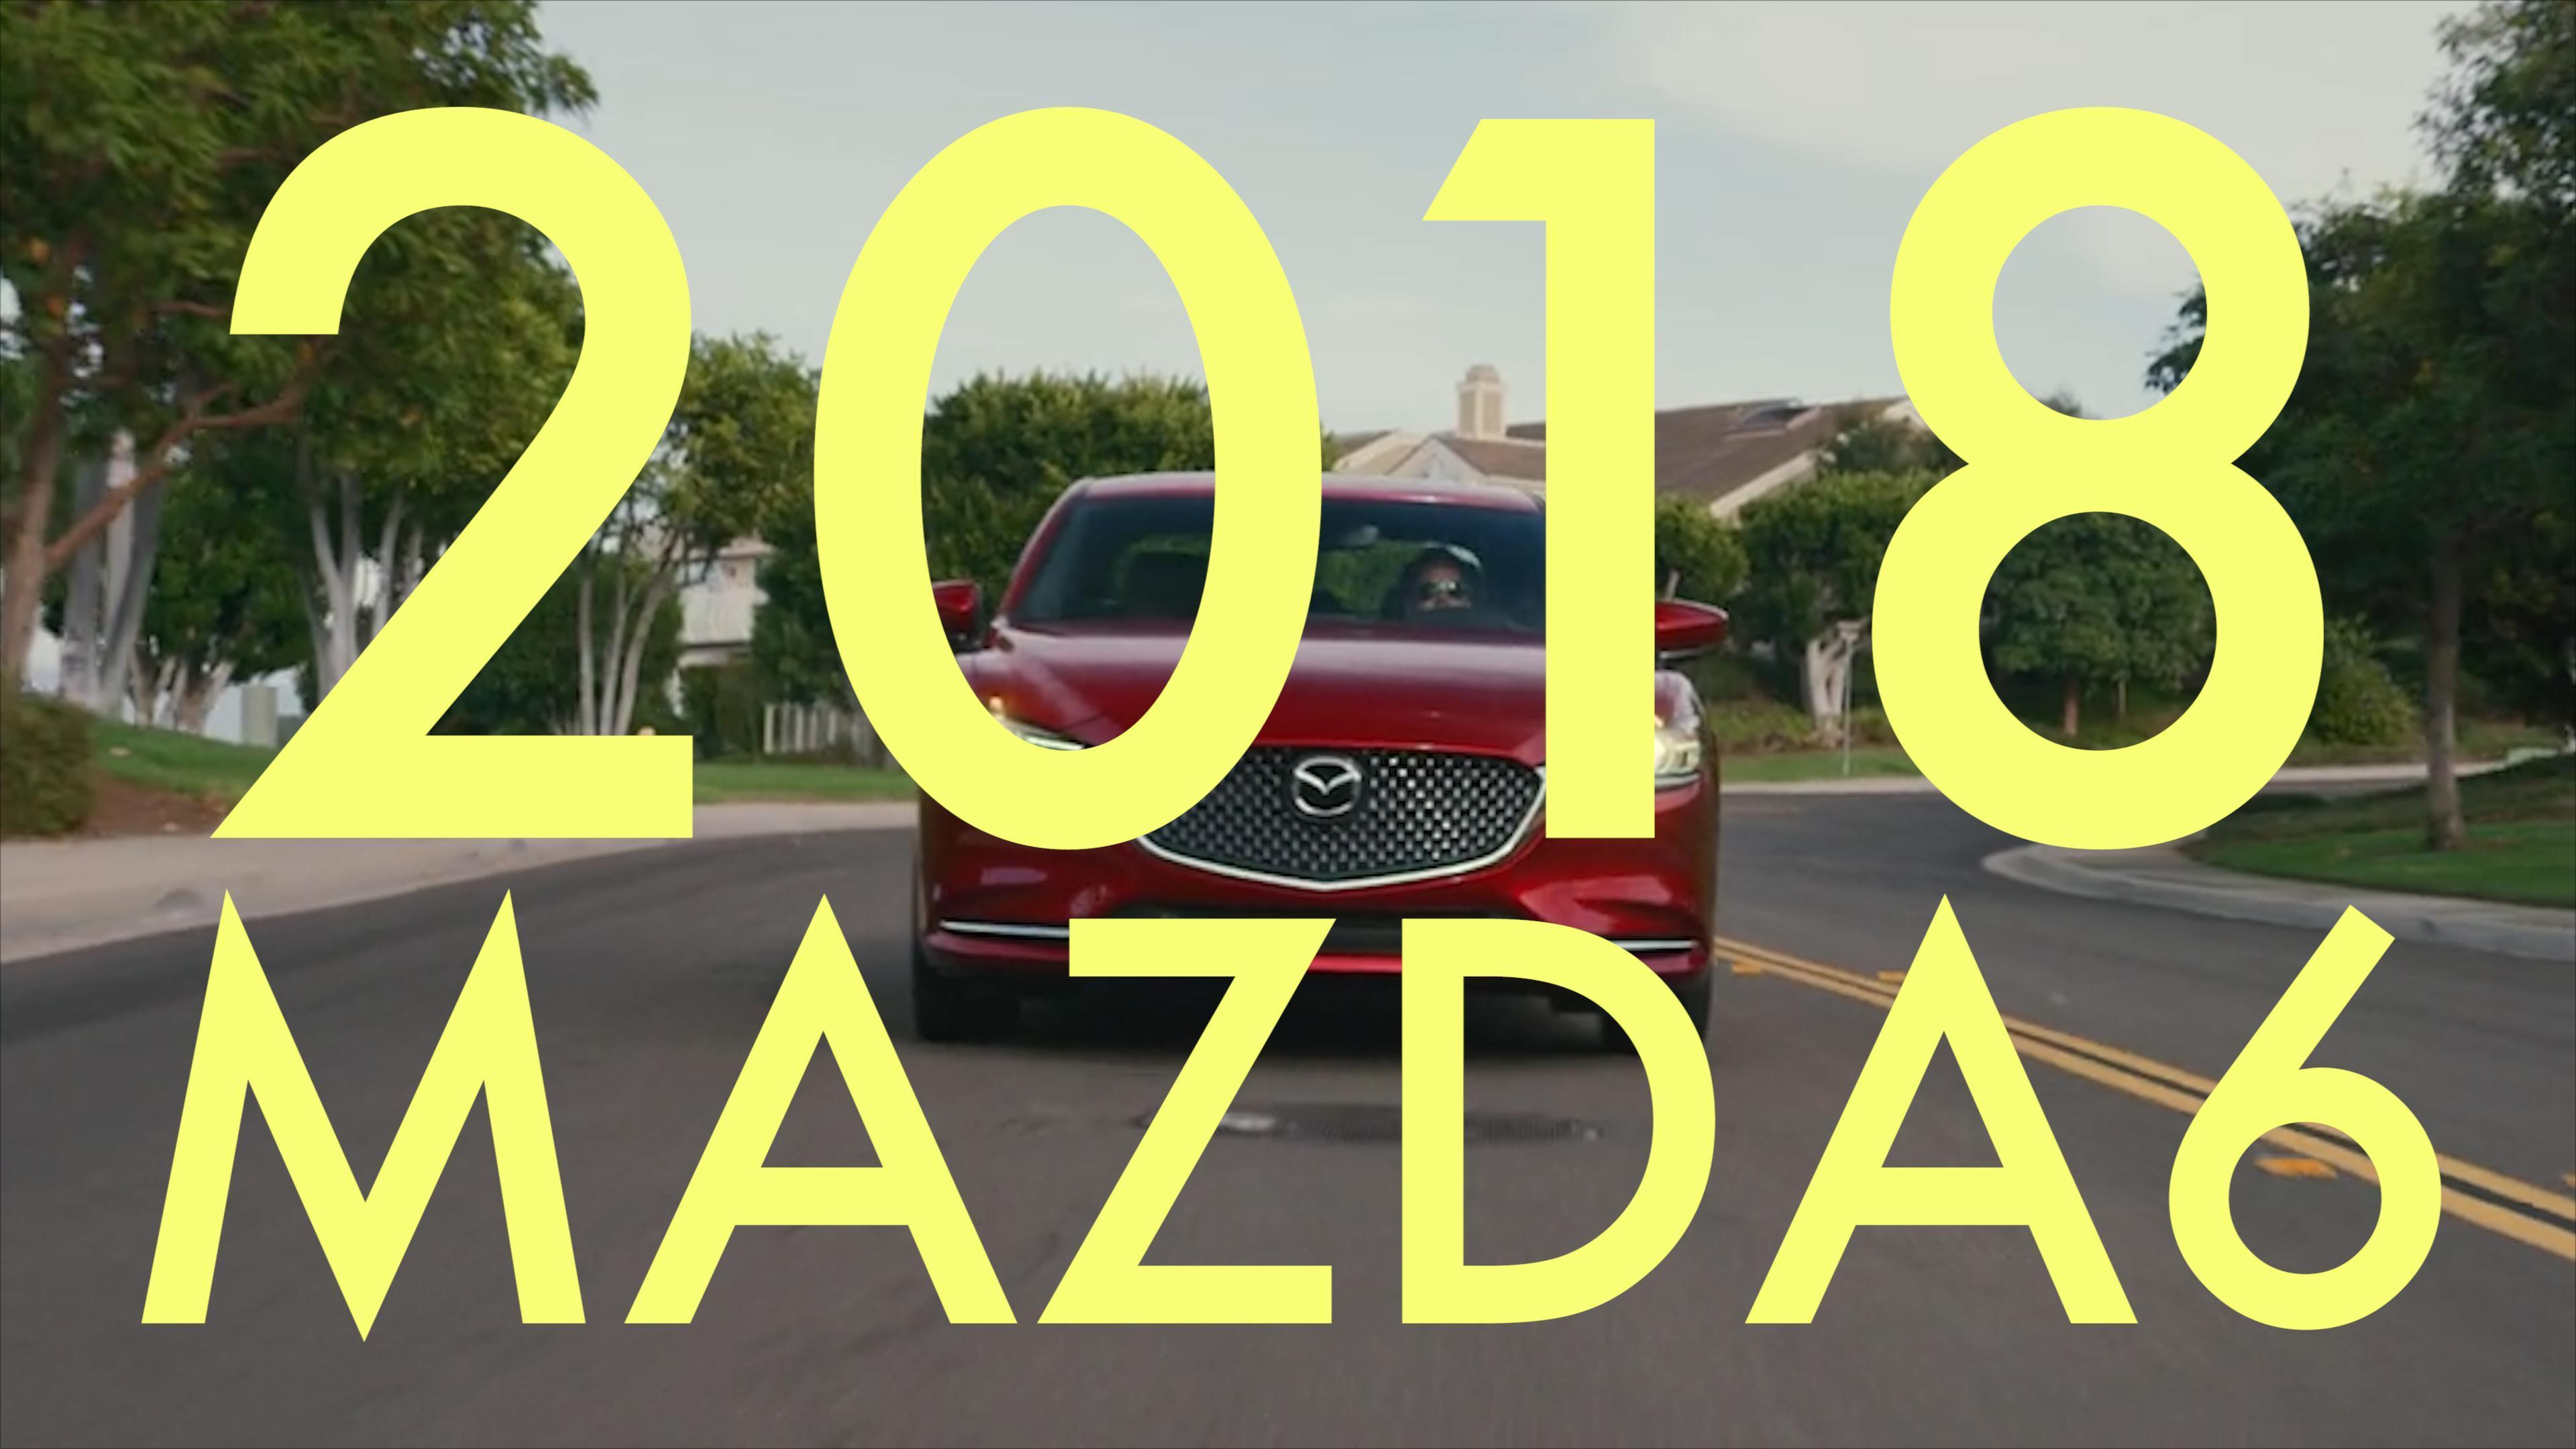 2019 Mazda Mx 5 Miata First Drive Review Autoblog Engine Plastic Skirt Diagram